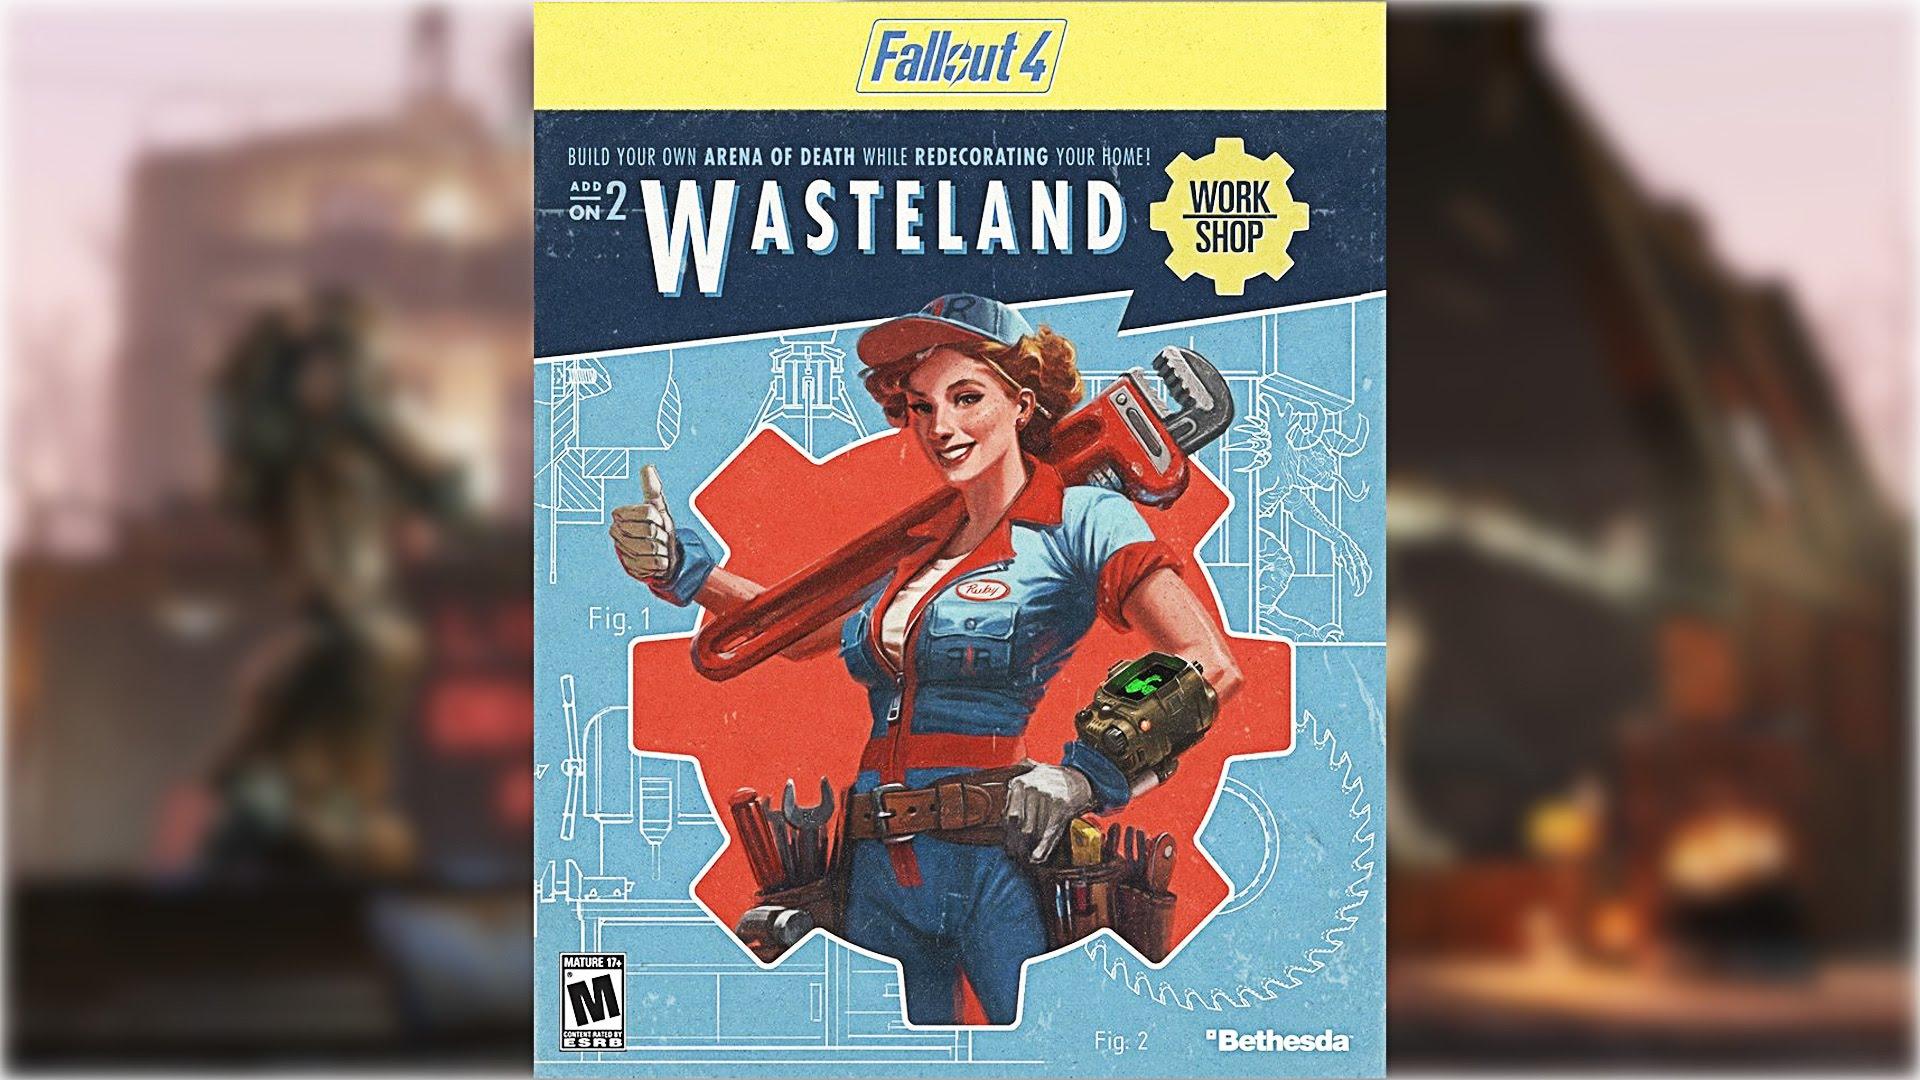 Fallout4 Wasteland Workshop  уже доступна для игры.